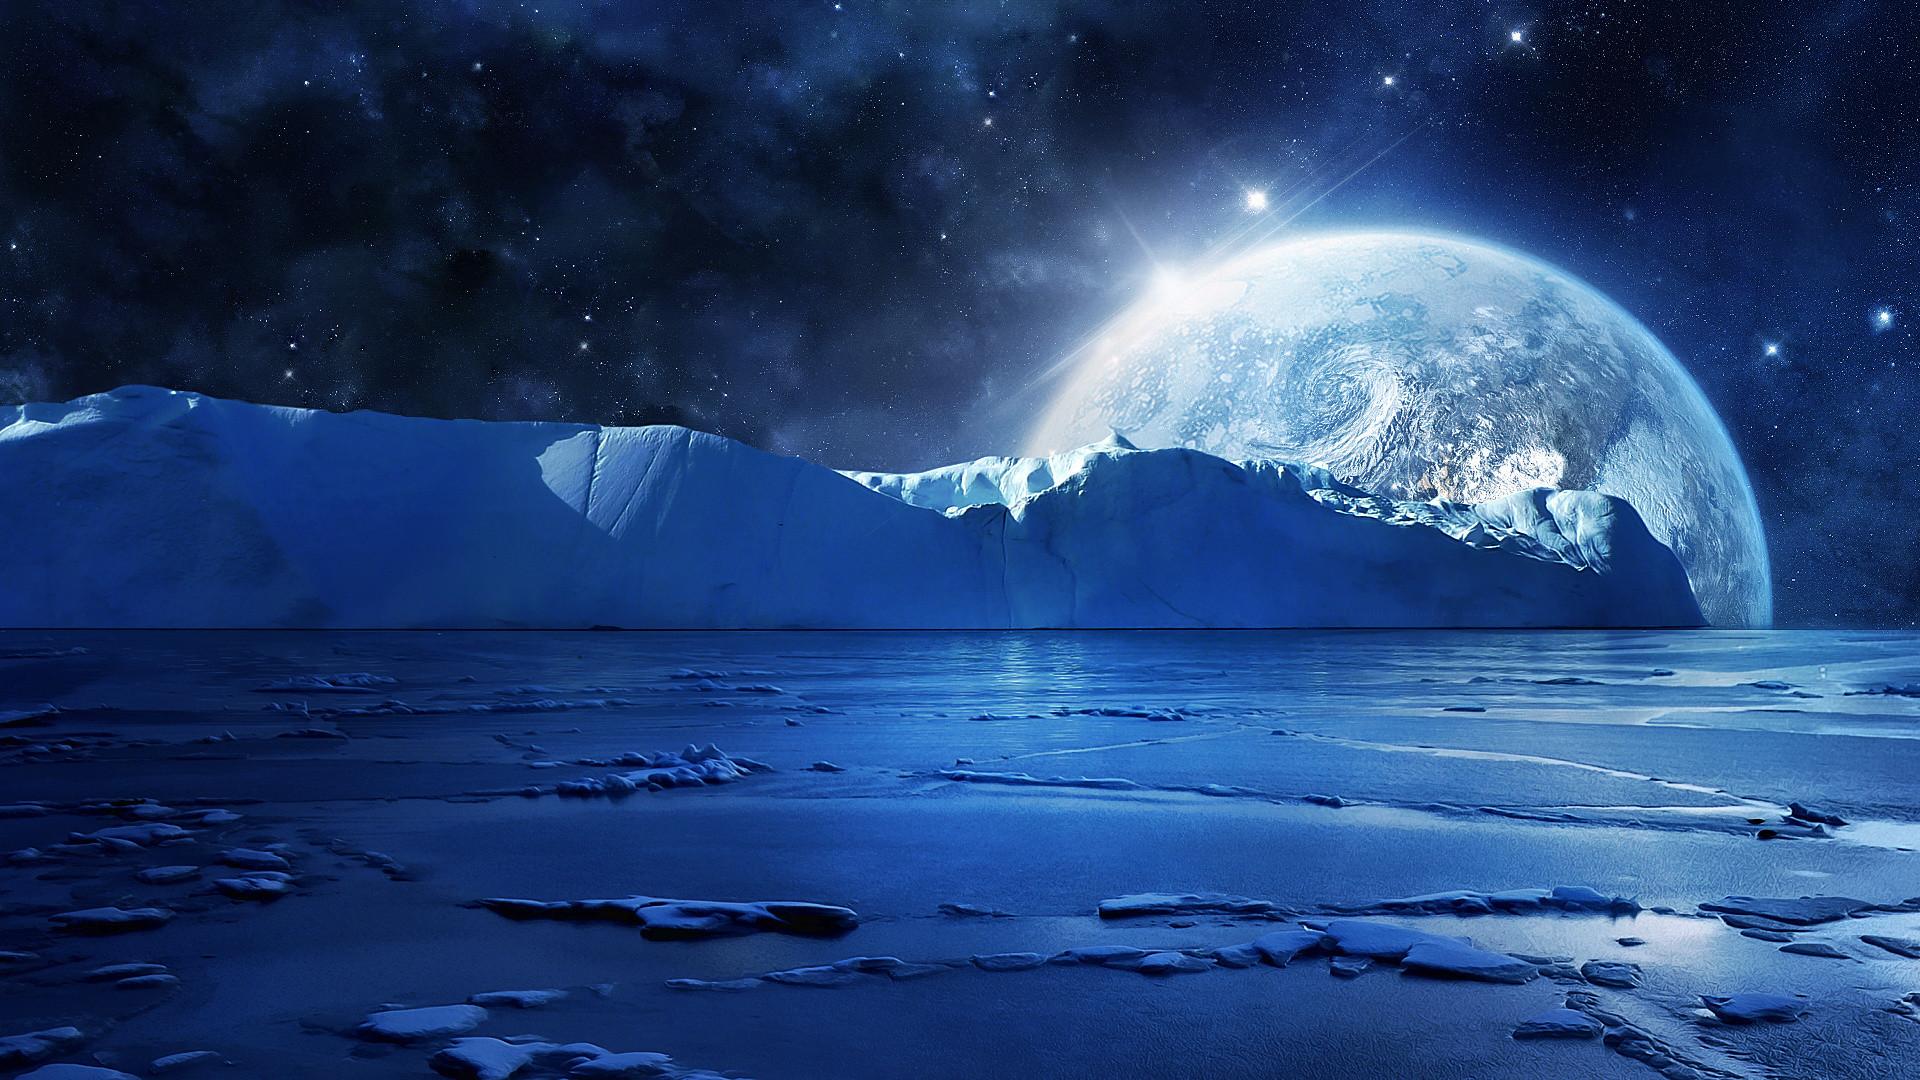 Nightfall Mountain Sea Moon Wallpaper Hd Desktop Wallpapers - Winter Moon Background - HD Wallpaper